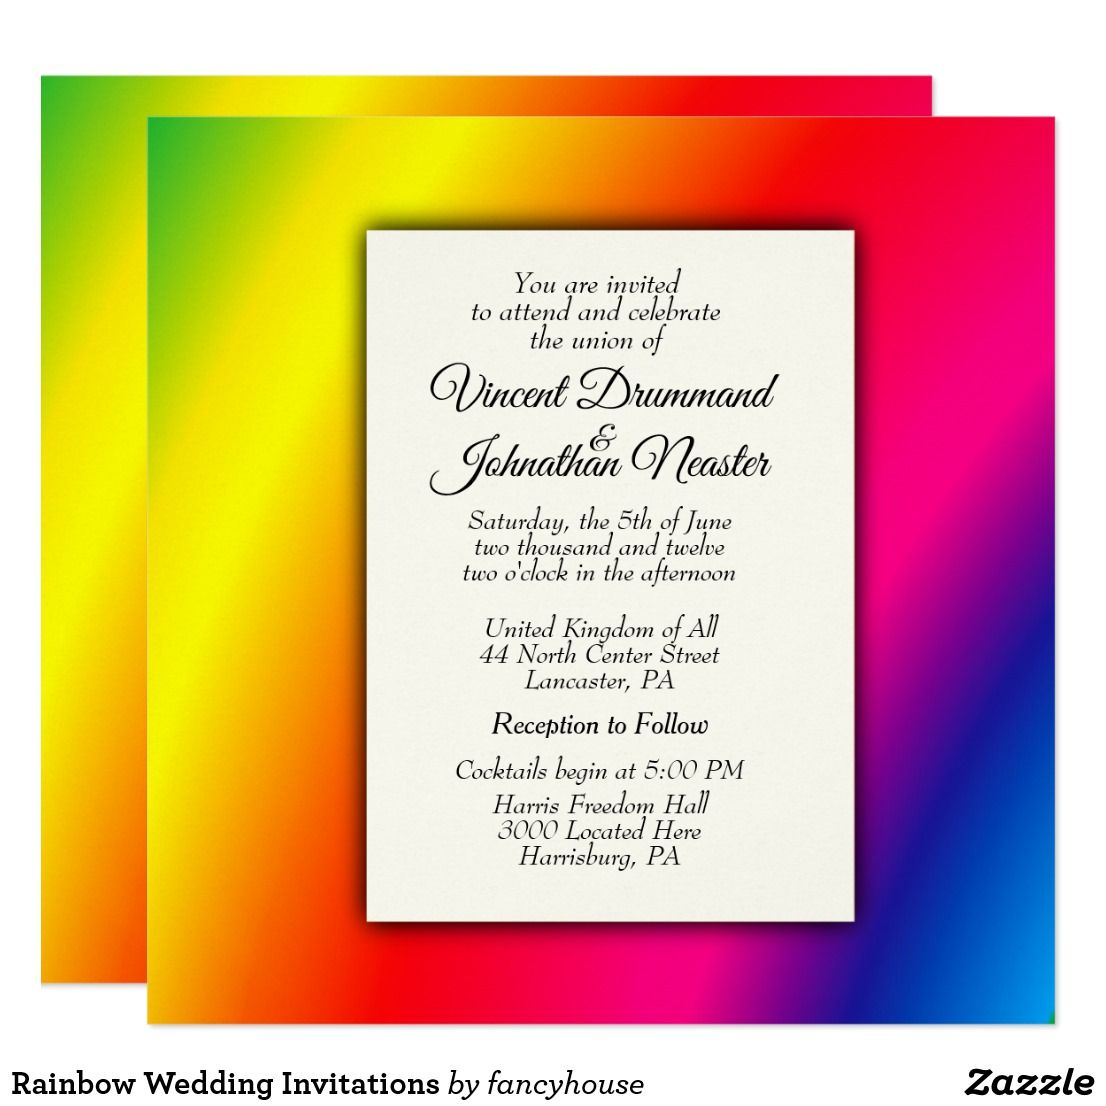 Rainbow Wedding Invitations 40% off | Wedding Invitations | Pinterest